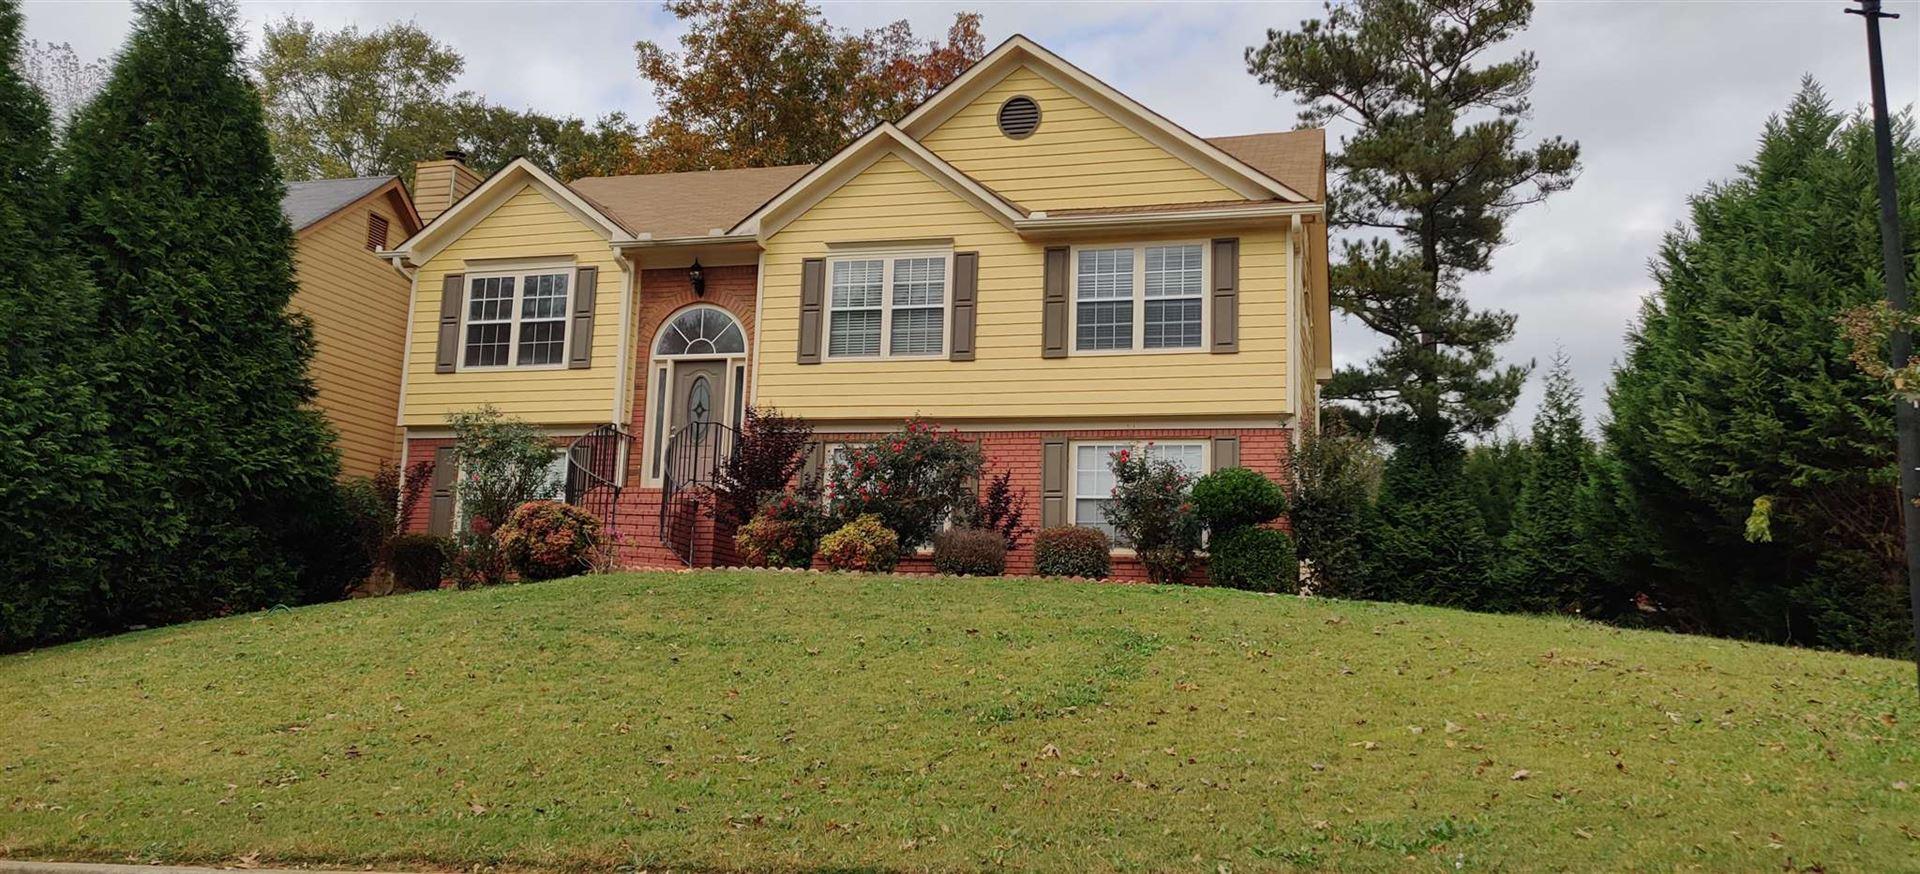 221 Oak Vista Ct, Lawrenceville, GA 30044 - MLS#: 8888158